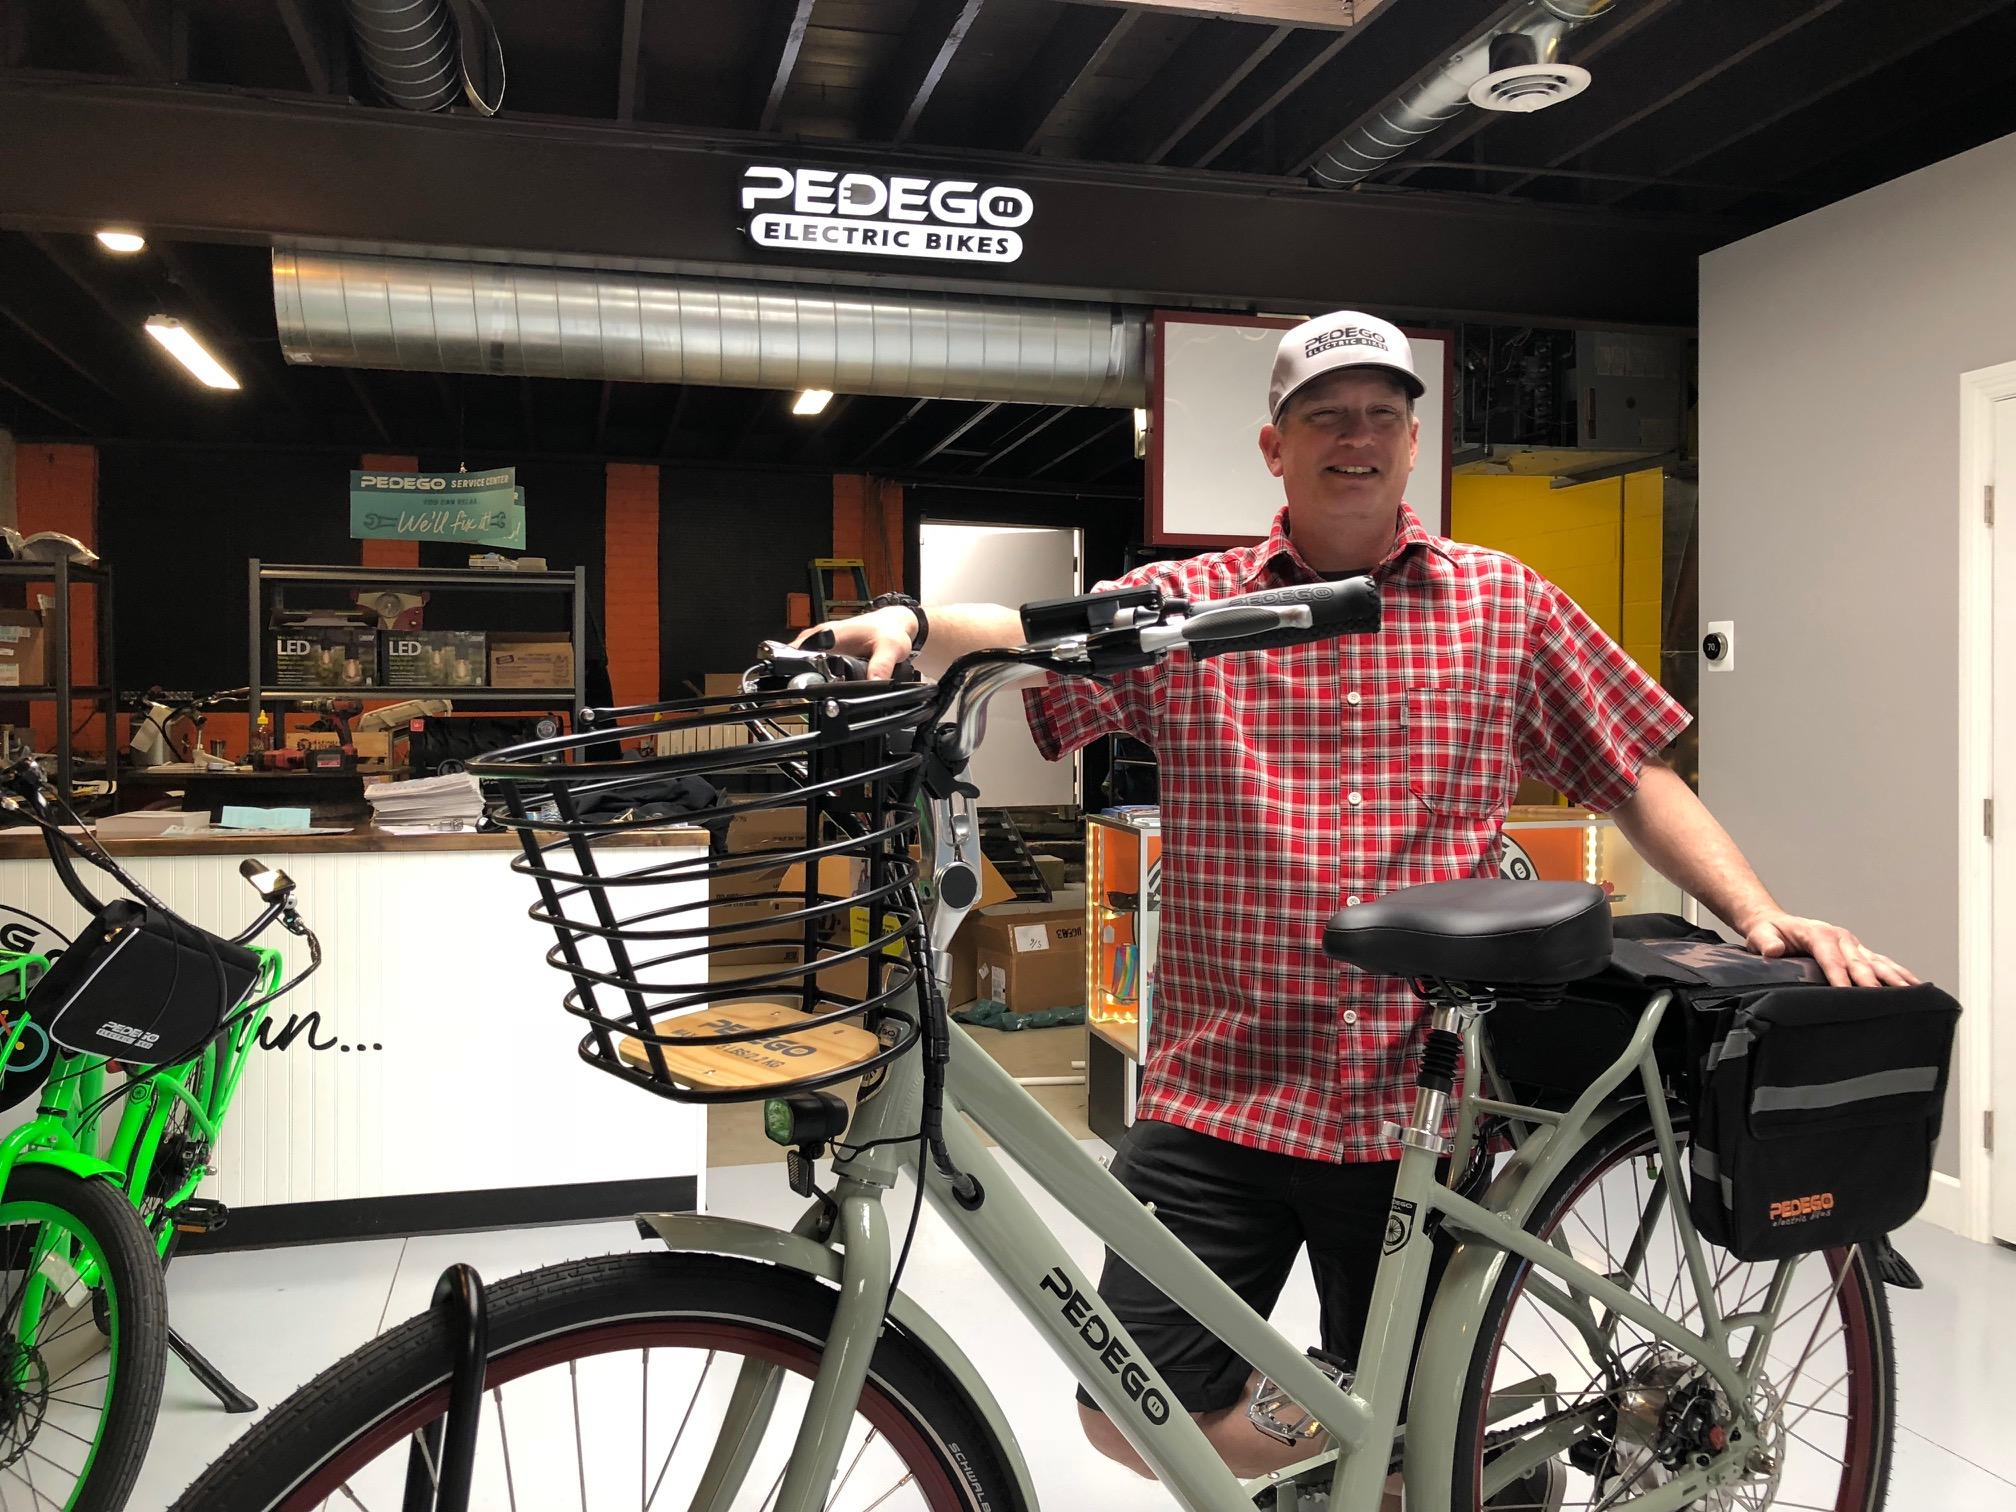 E-Bikes cause smils at Pedego in Salt Lake City. Photo by Dave Iltis